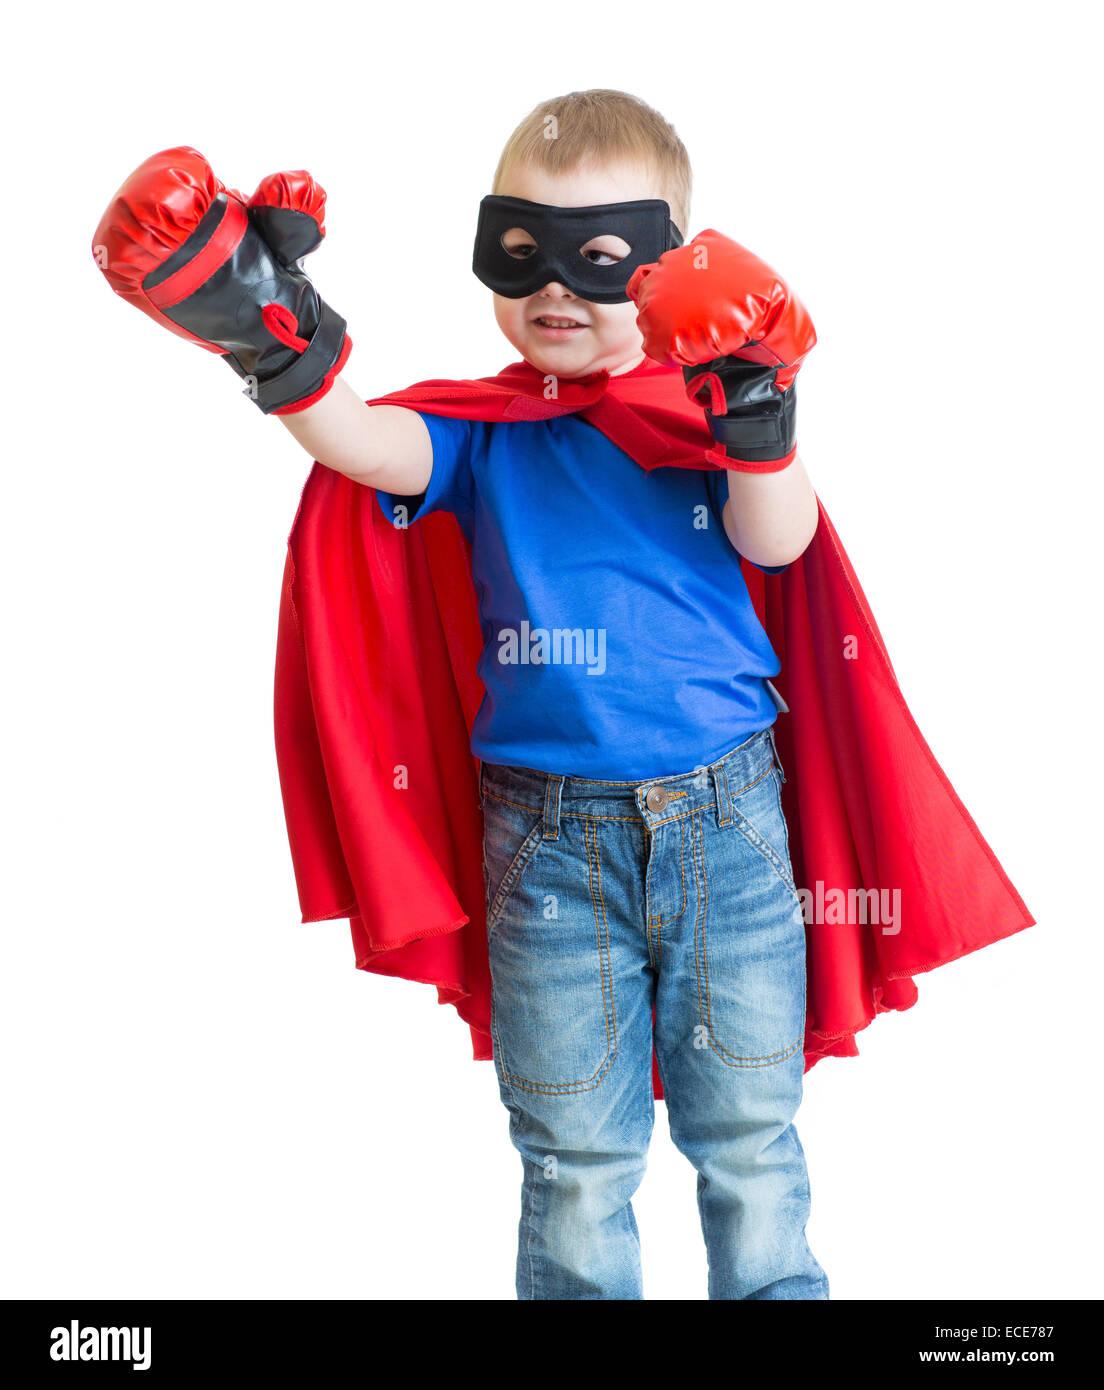 Superhero kid boy in mask playing isolated - Stock Image